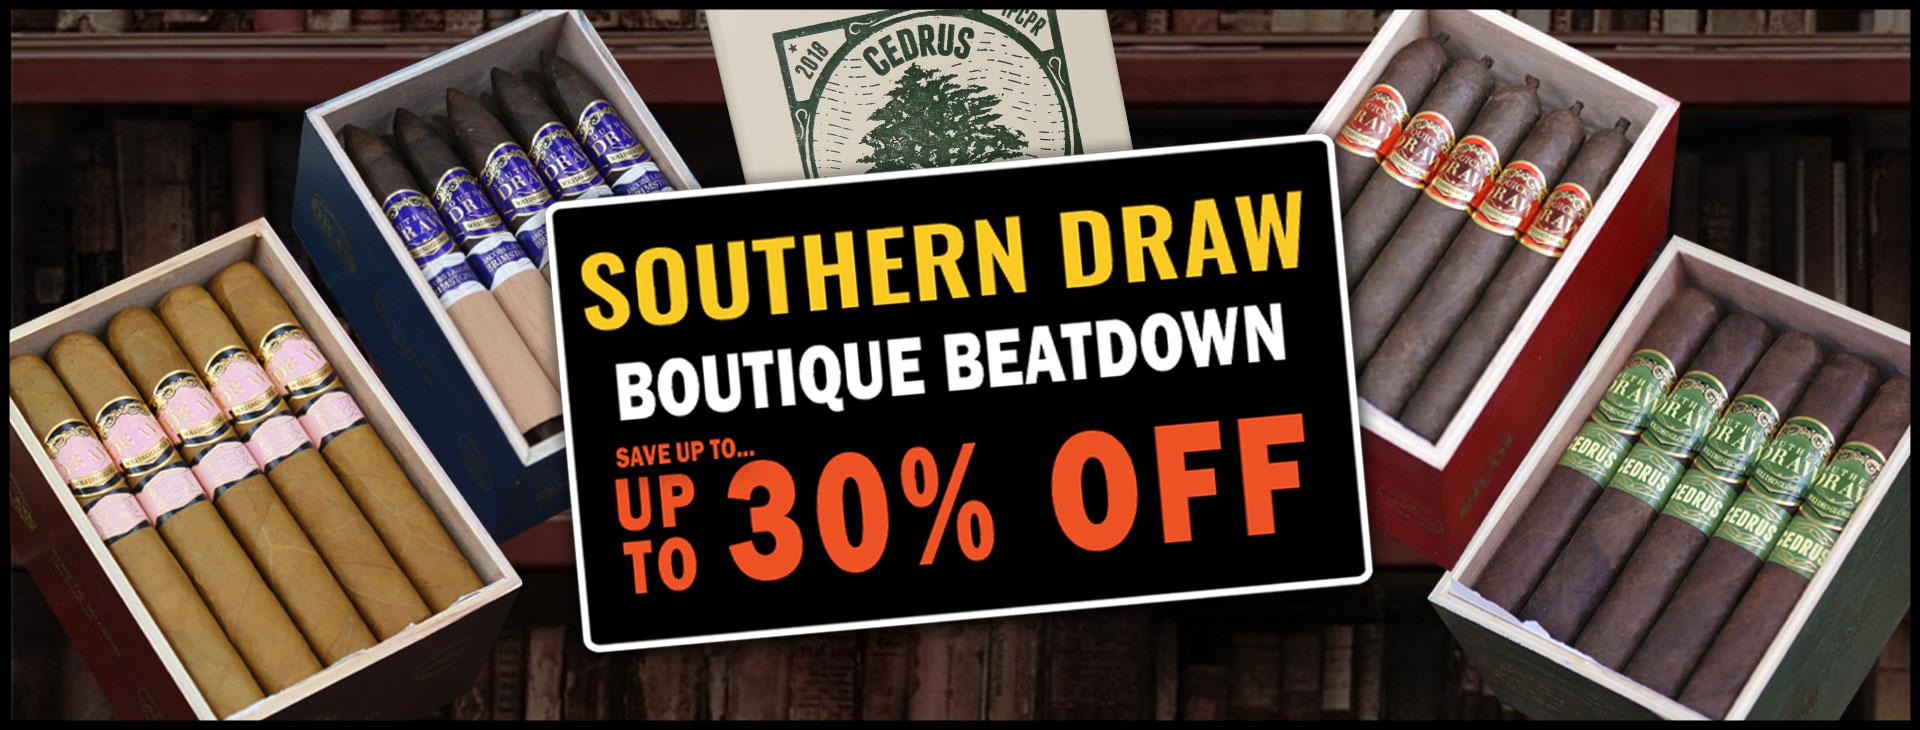 southern-draw-boutique-beatdown-2022-banner.jpg